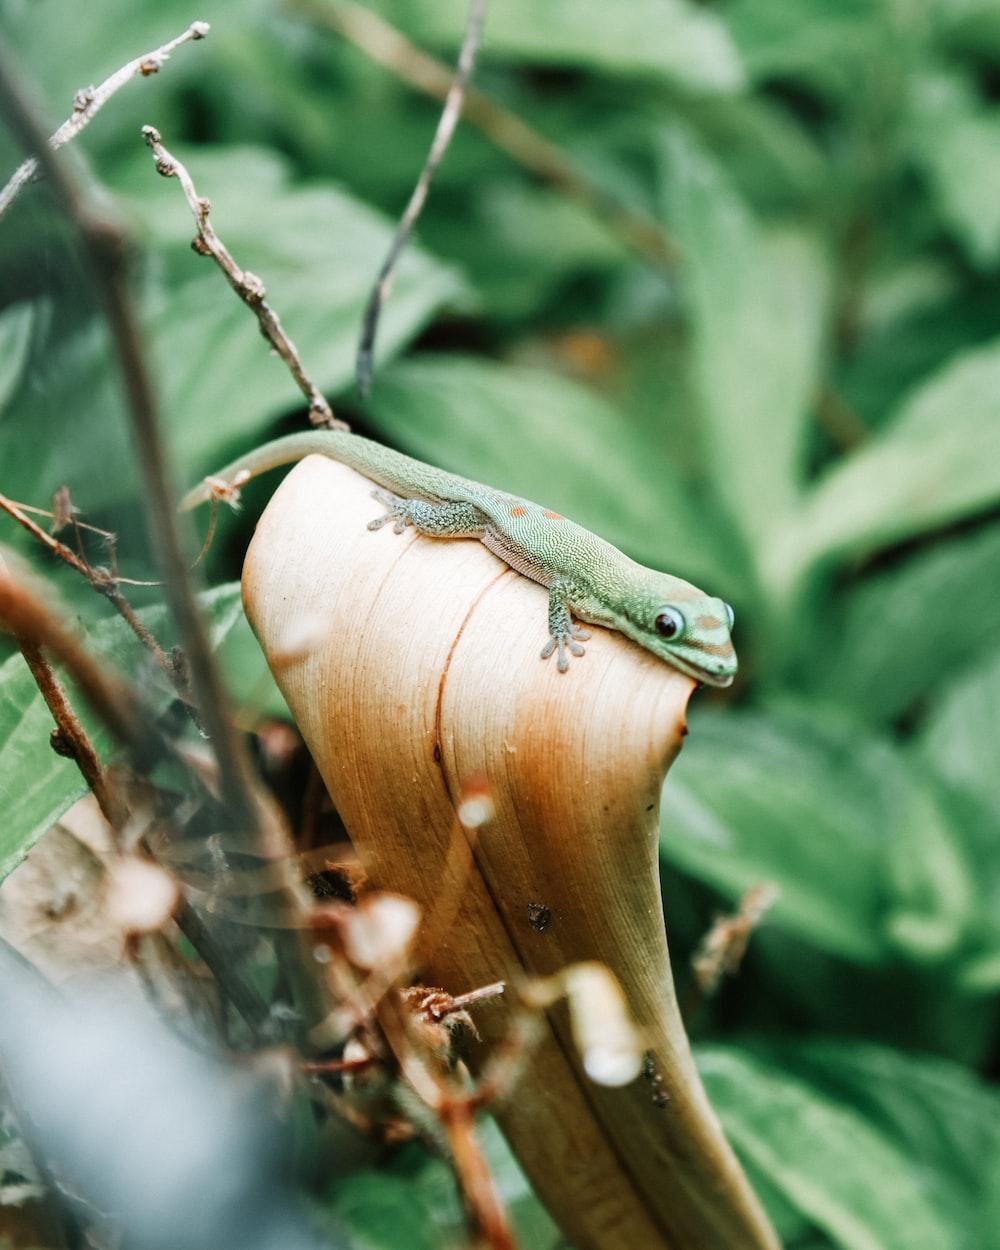 green lizard on brown wooden tree branch